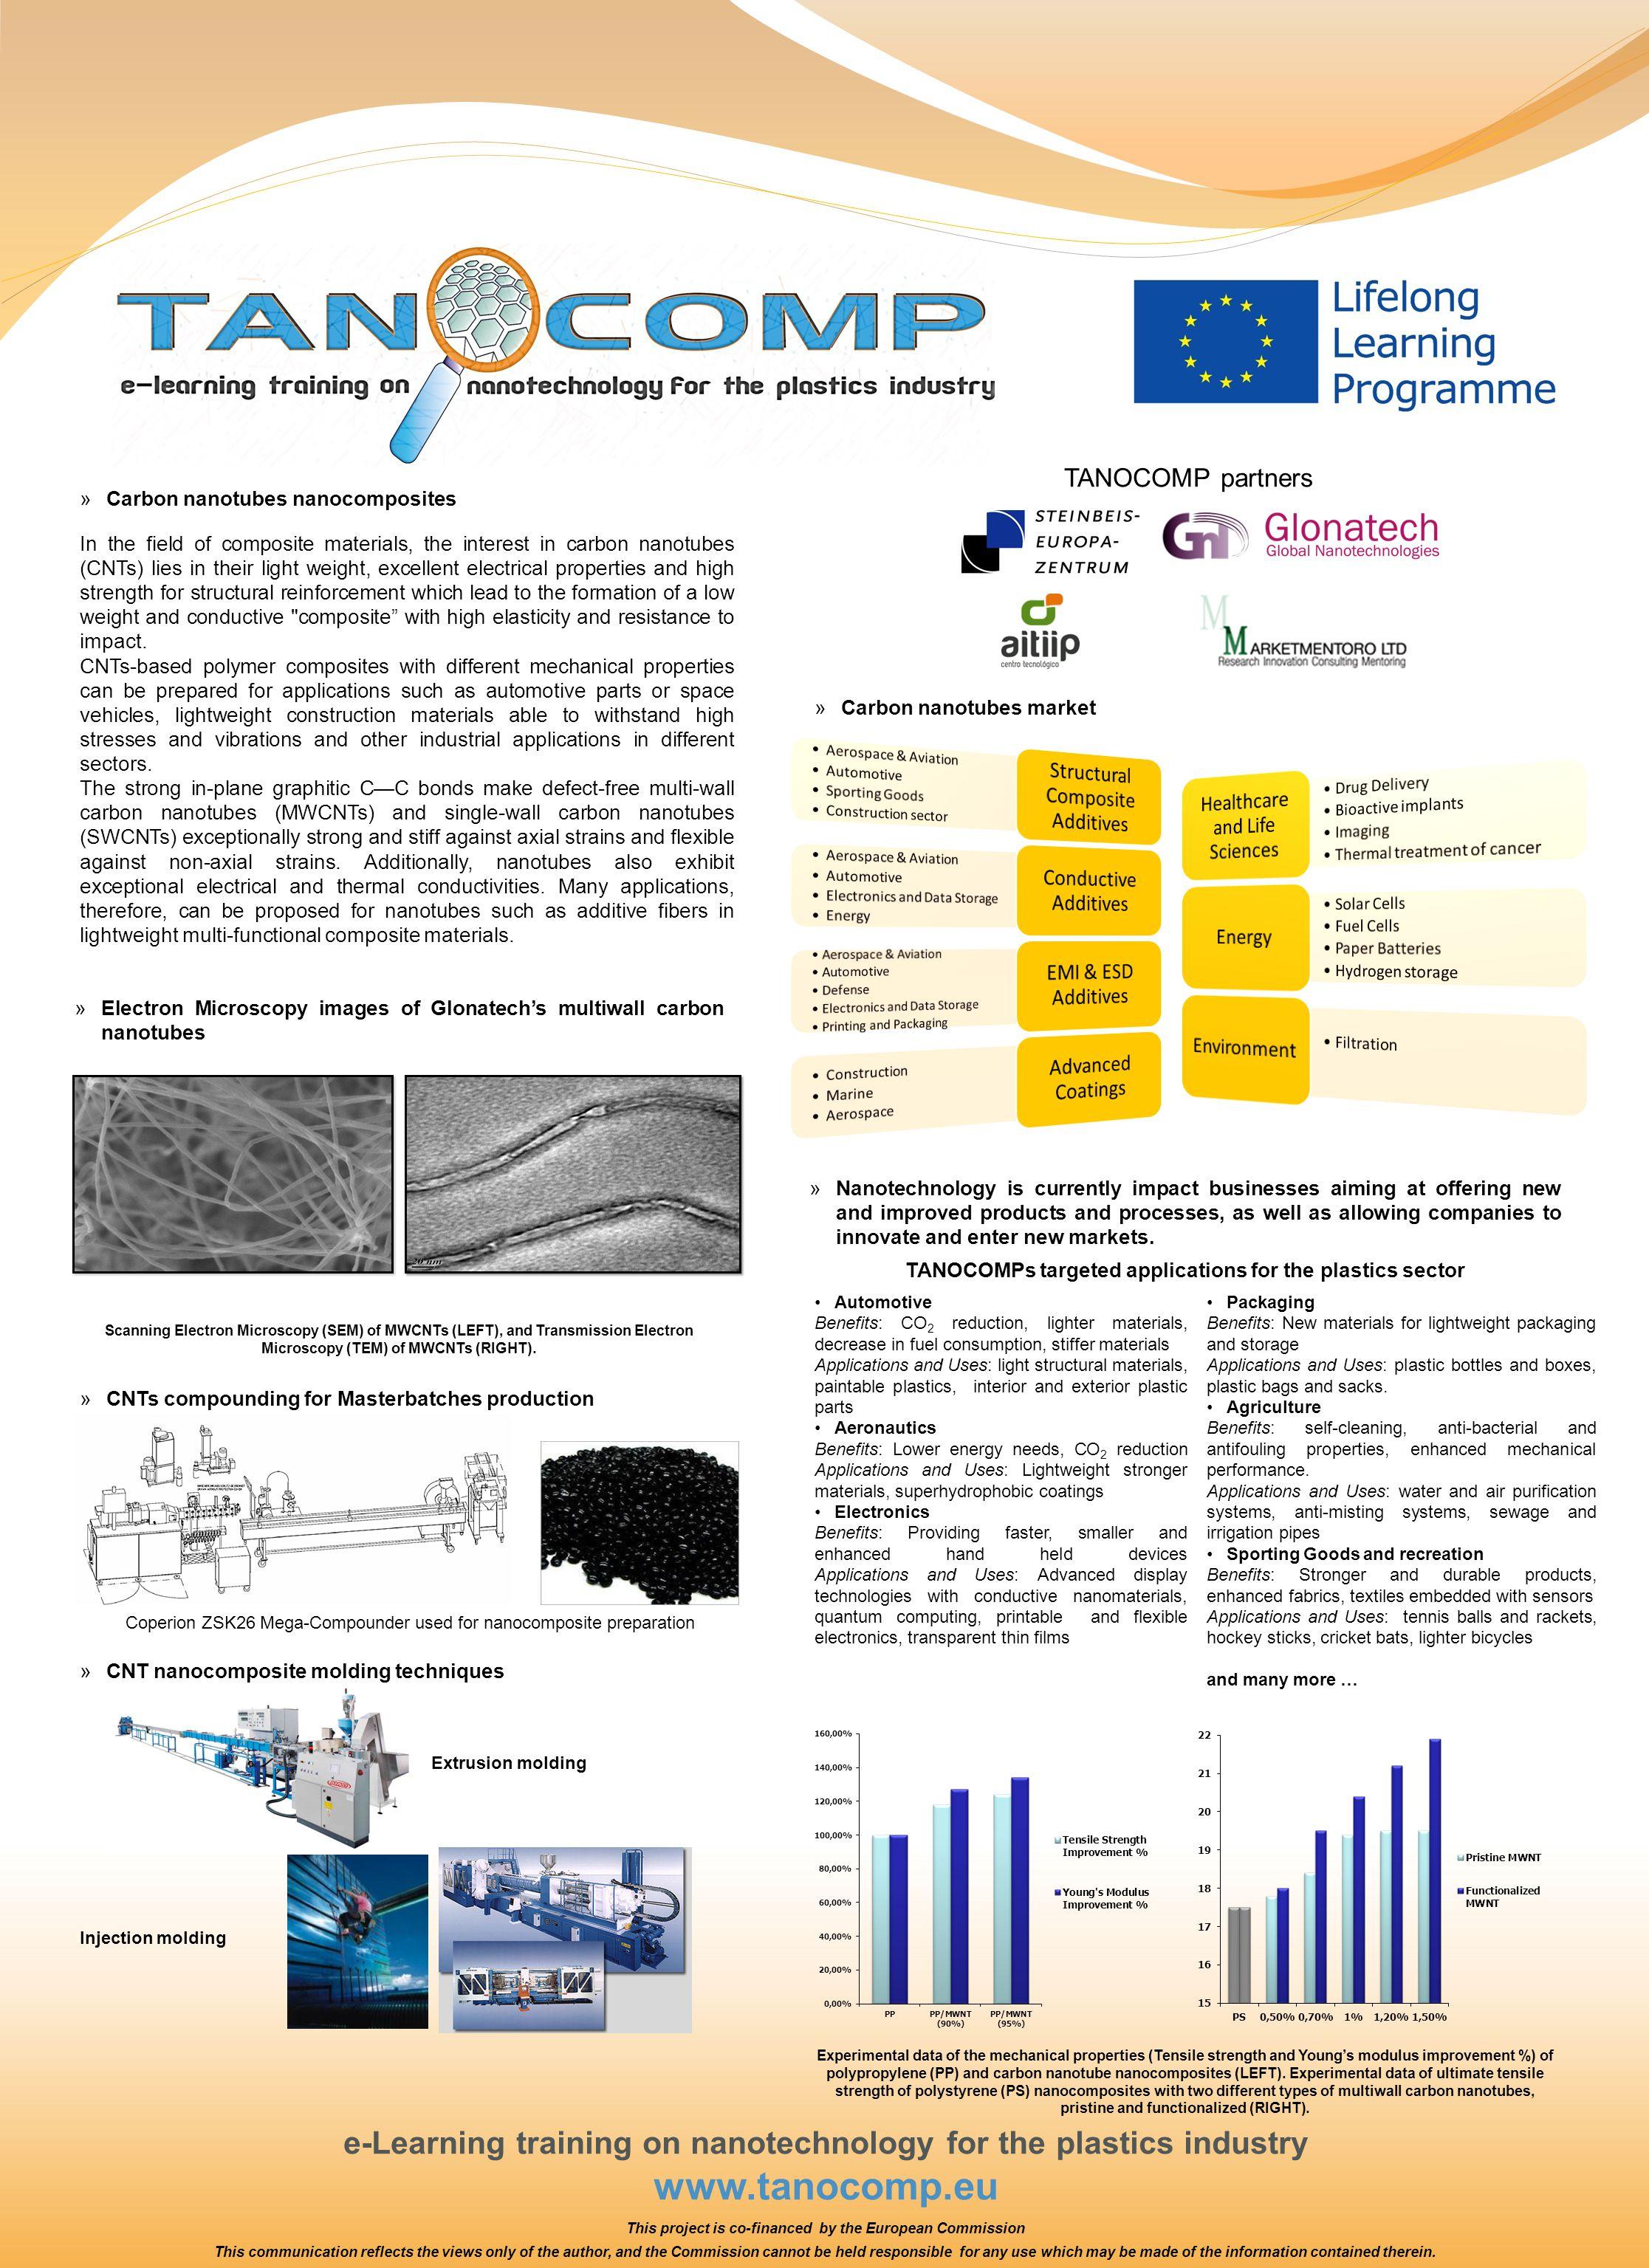 TANOCOMP partners Carbon nanotubes nanocomposites.